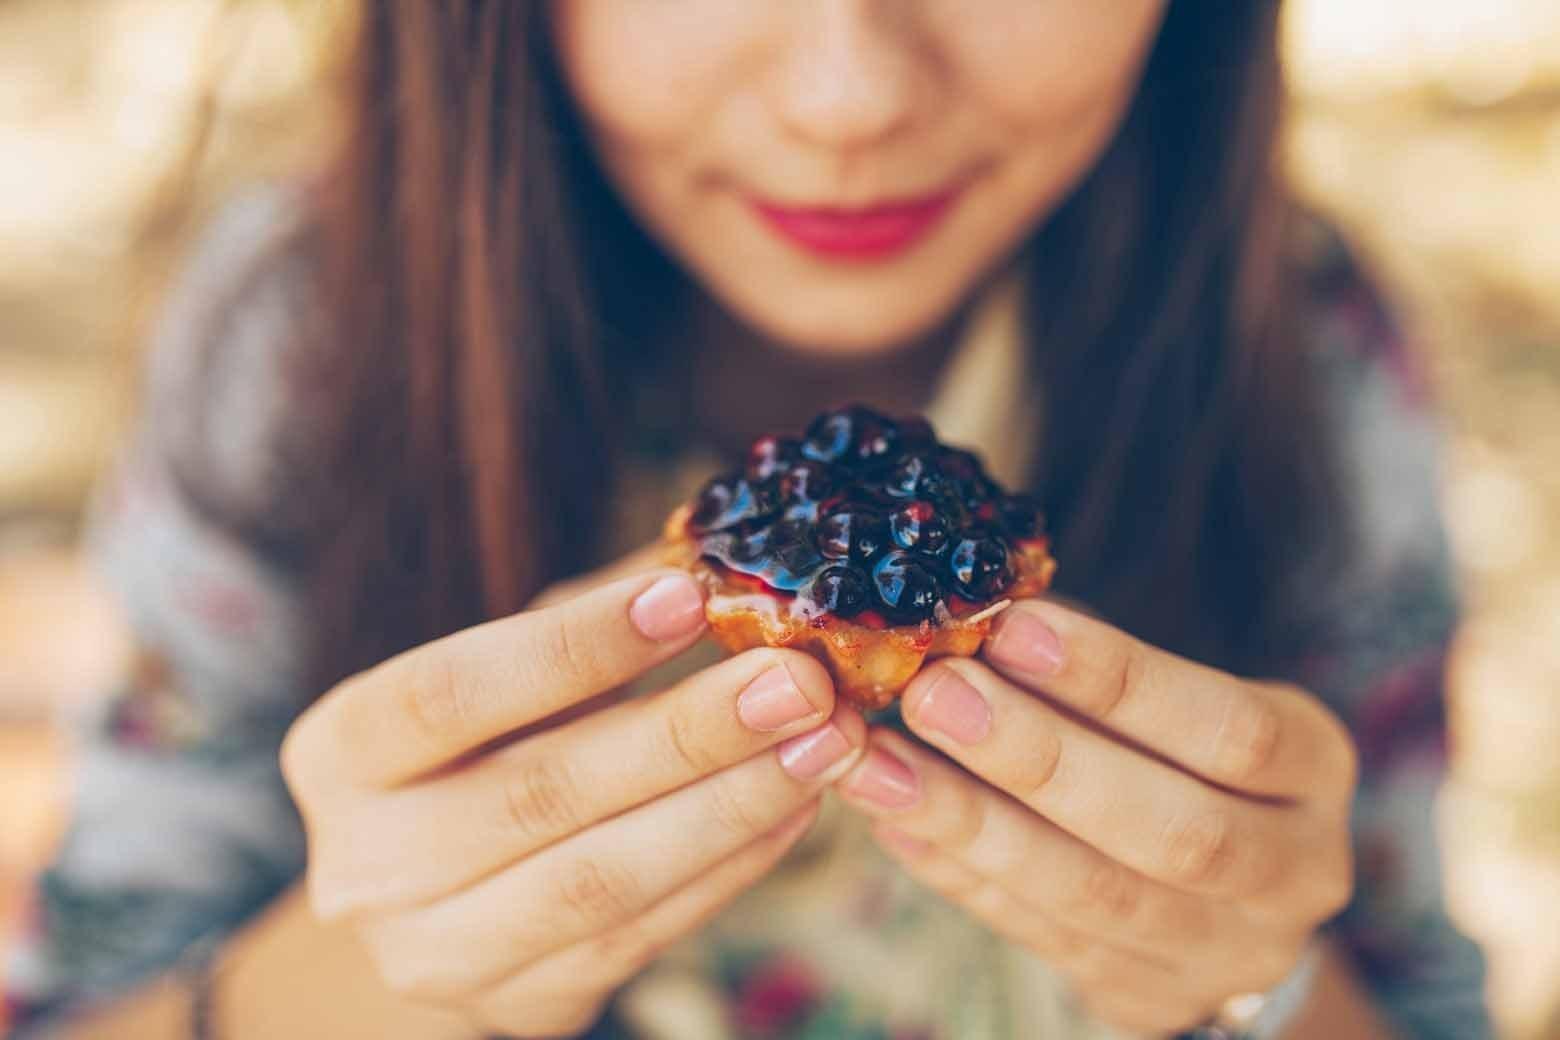 7-Tips-for-Life-in-Chewable-Bites.jpg